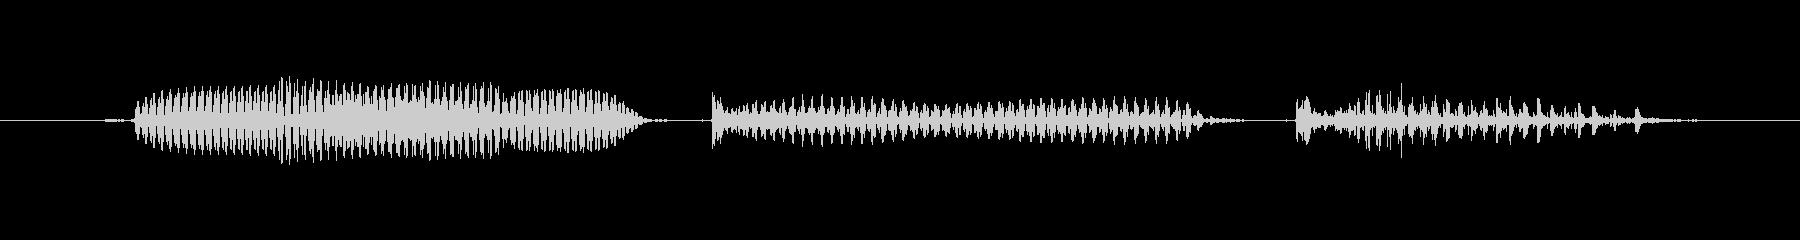 Somehow (boys, boys)'s unreproduced waveform